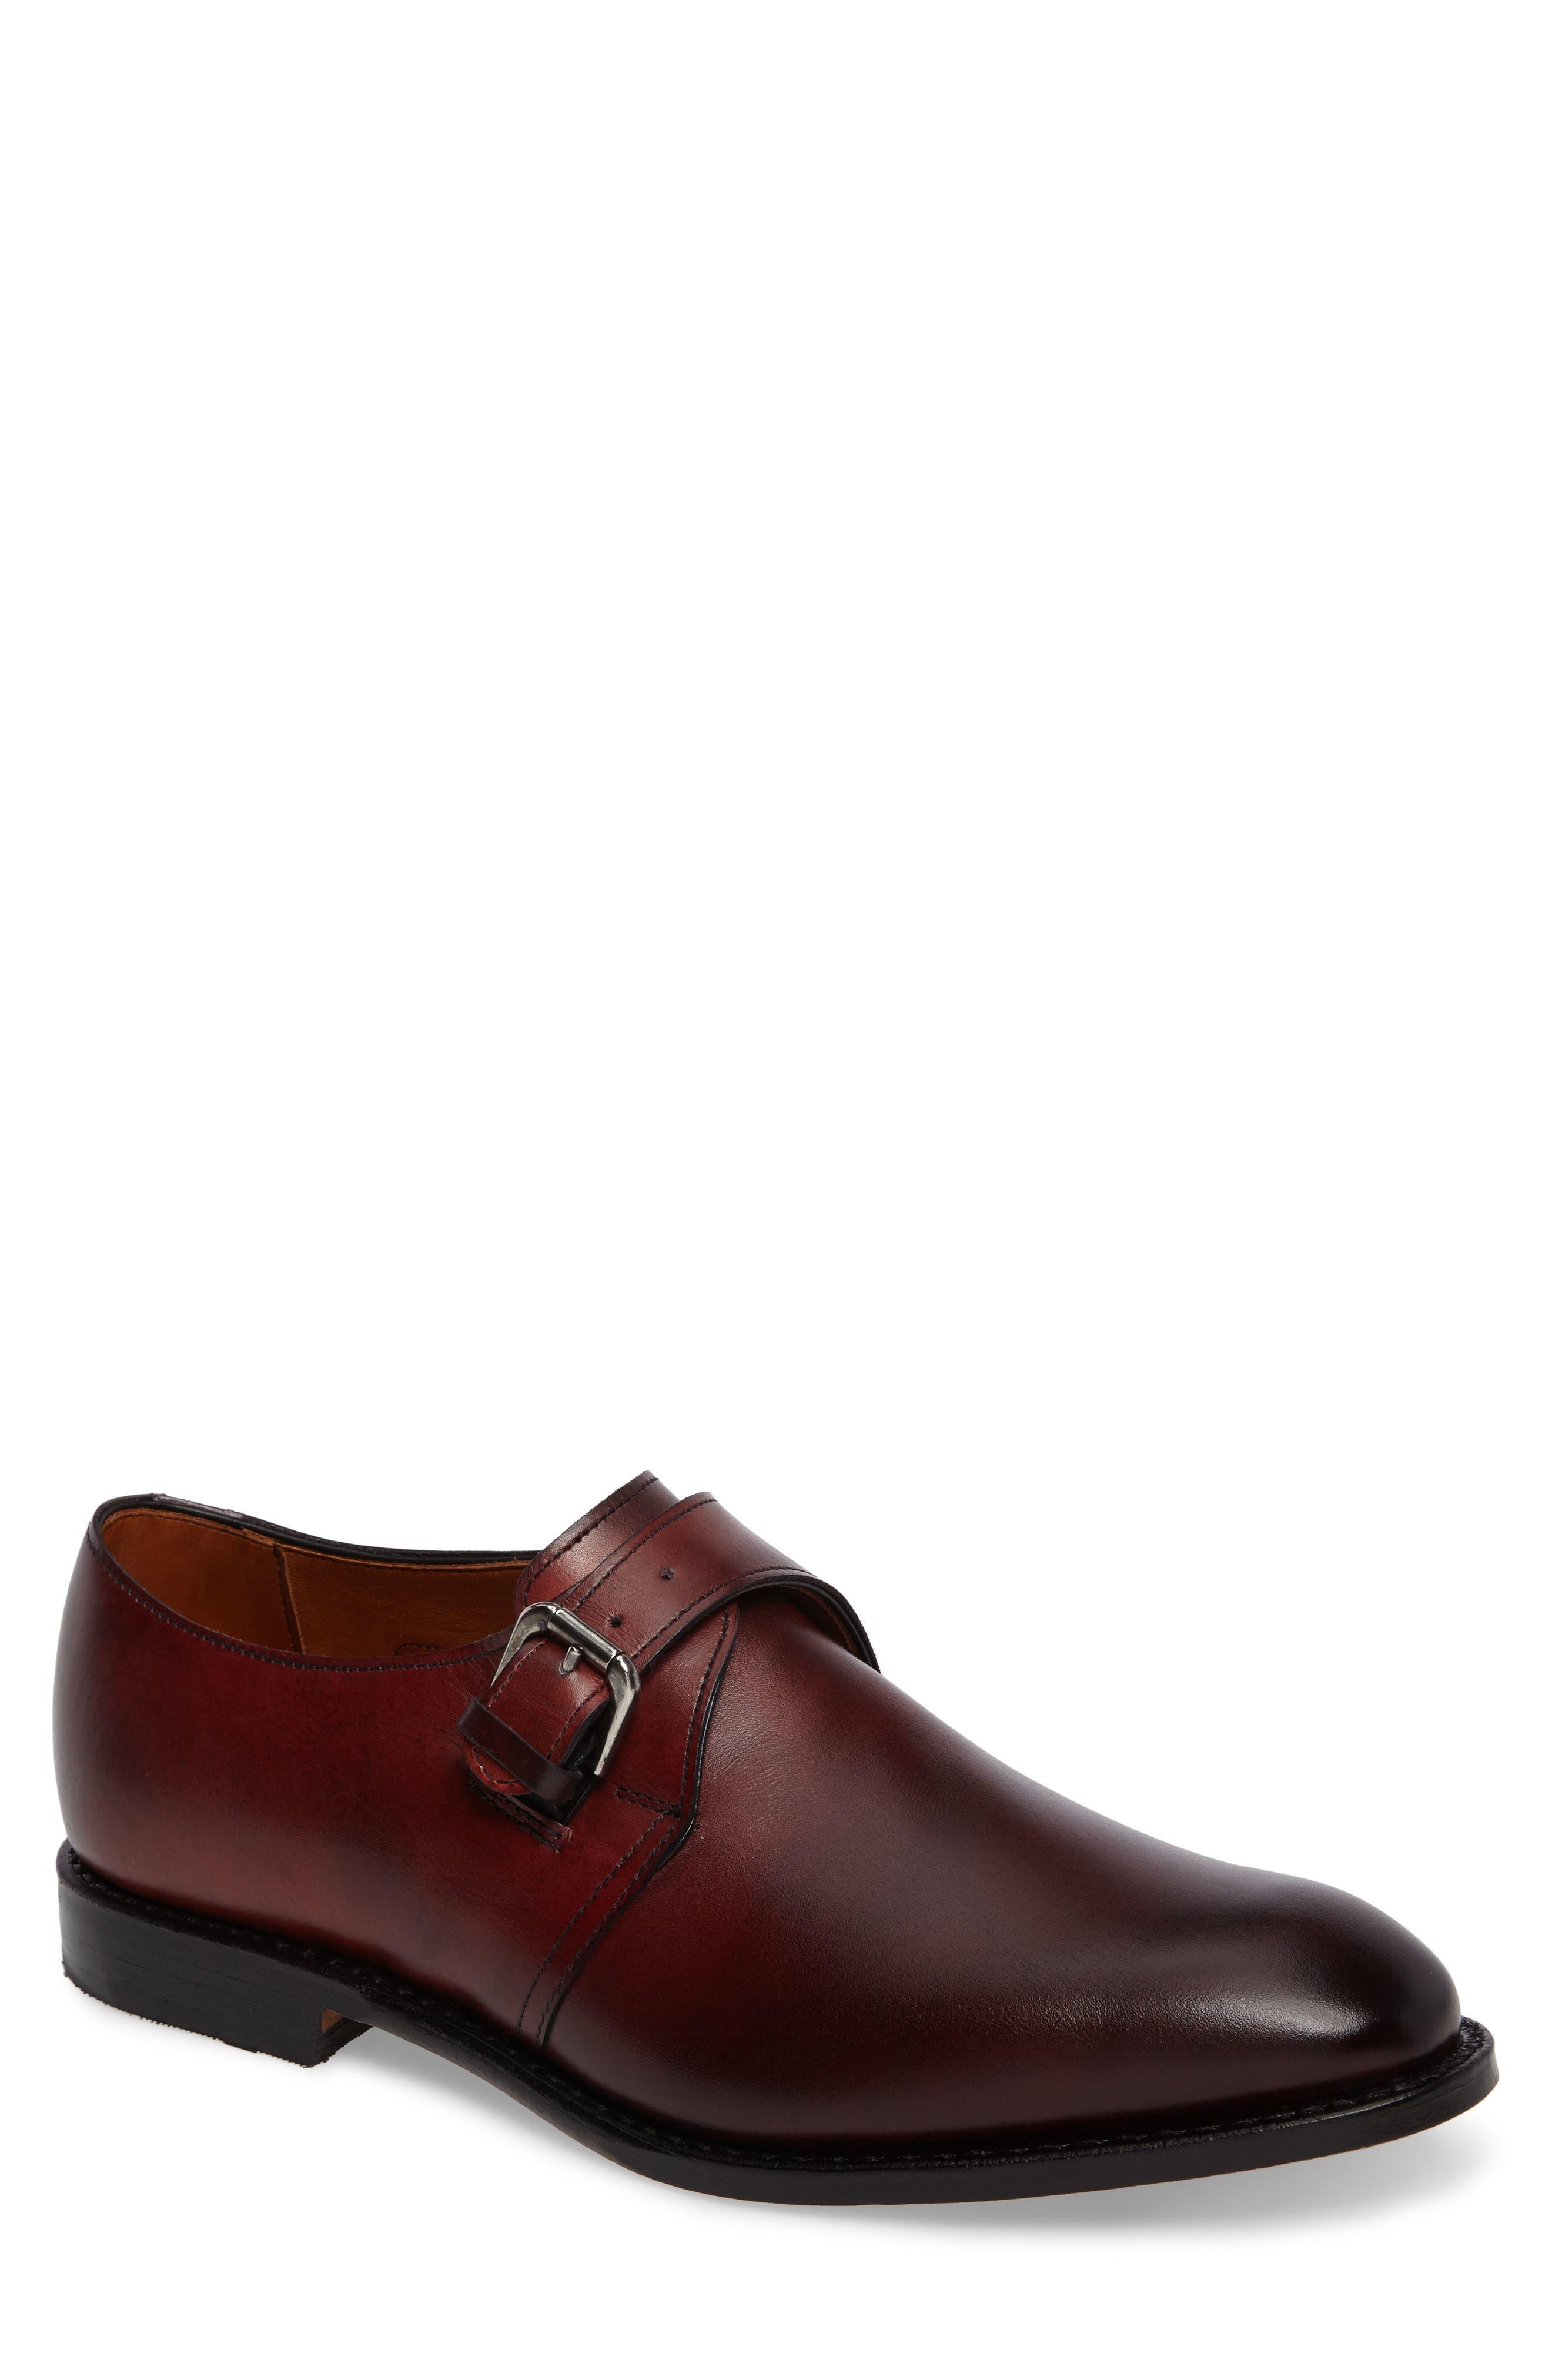 Warwick Monk Strap Shoe,                         Main,                         color, 932